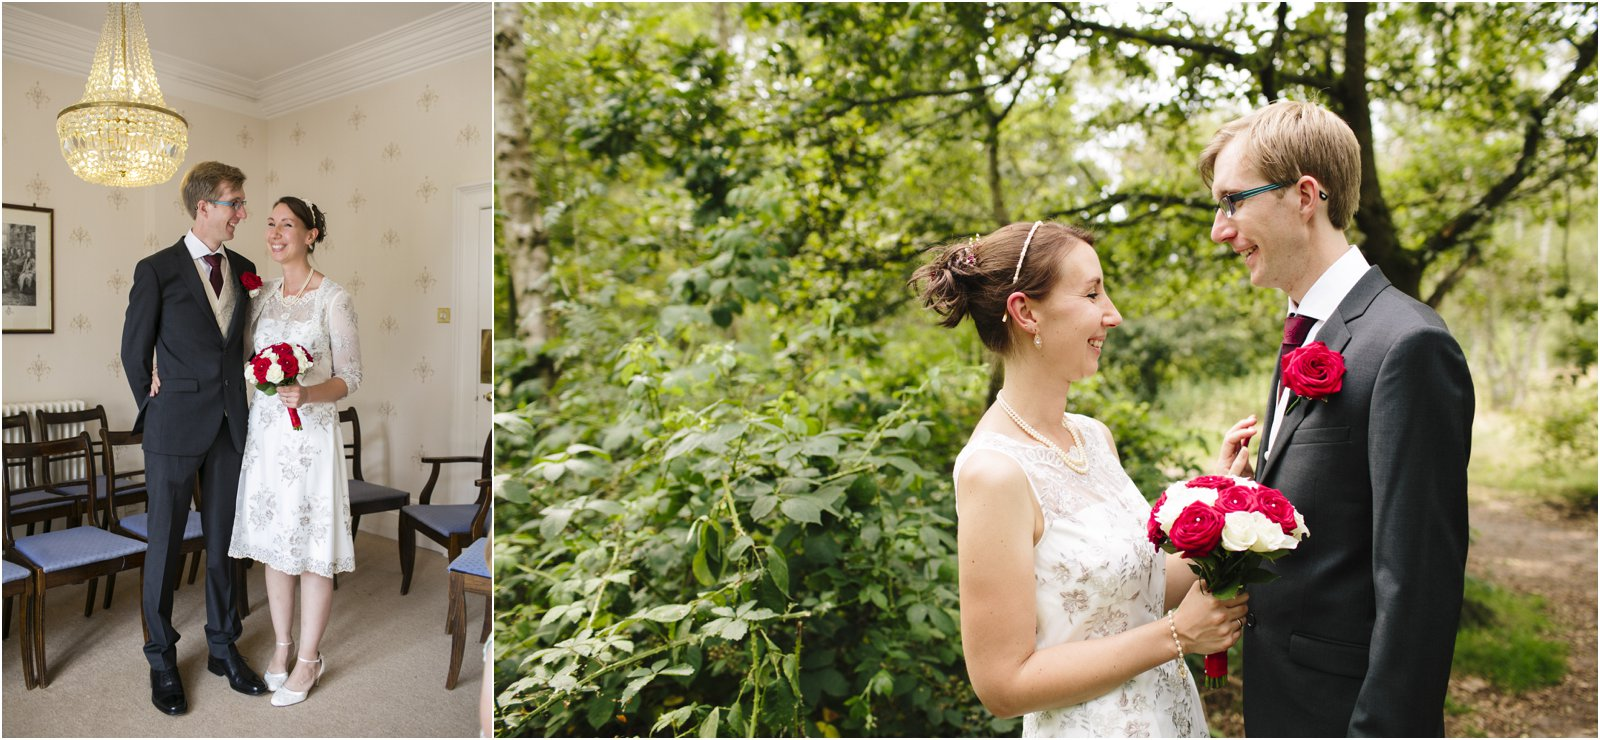 ian-olsson-wedding-photography-2014-081